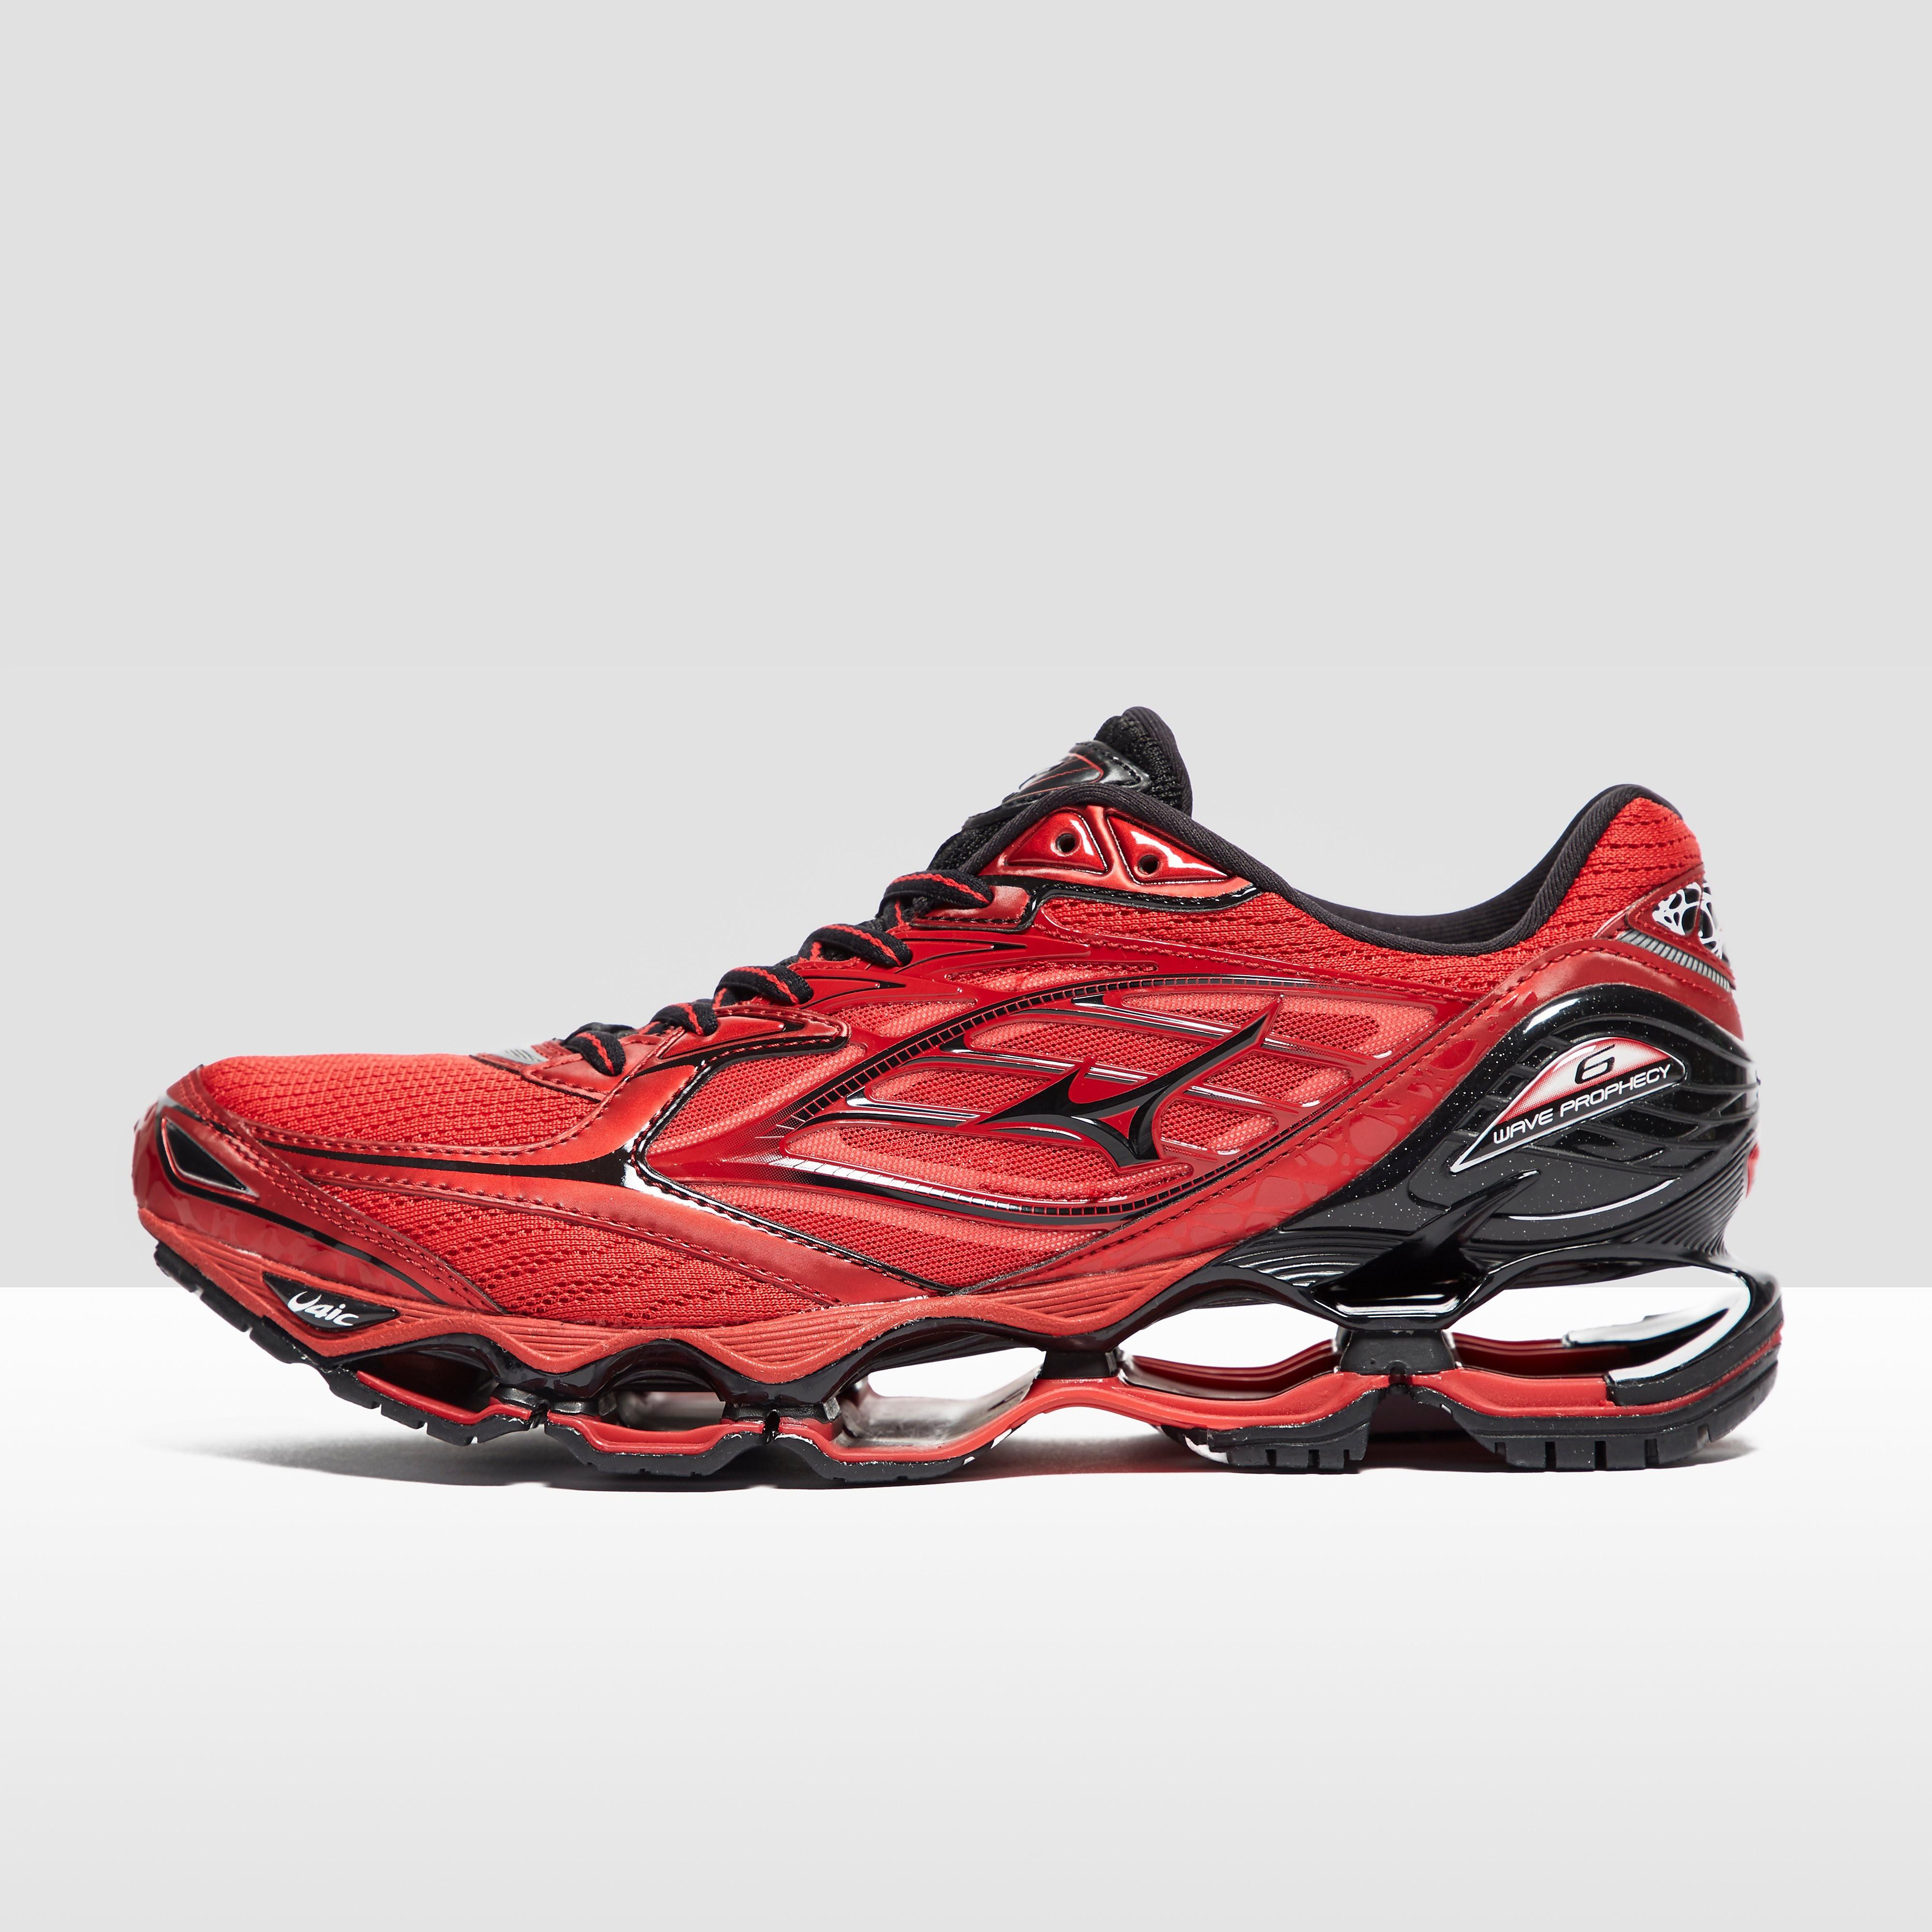 Mizuno Wave Prophecy 6 Men's Running Shoes